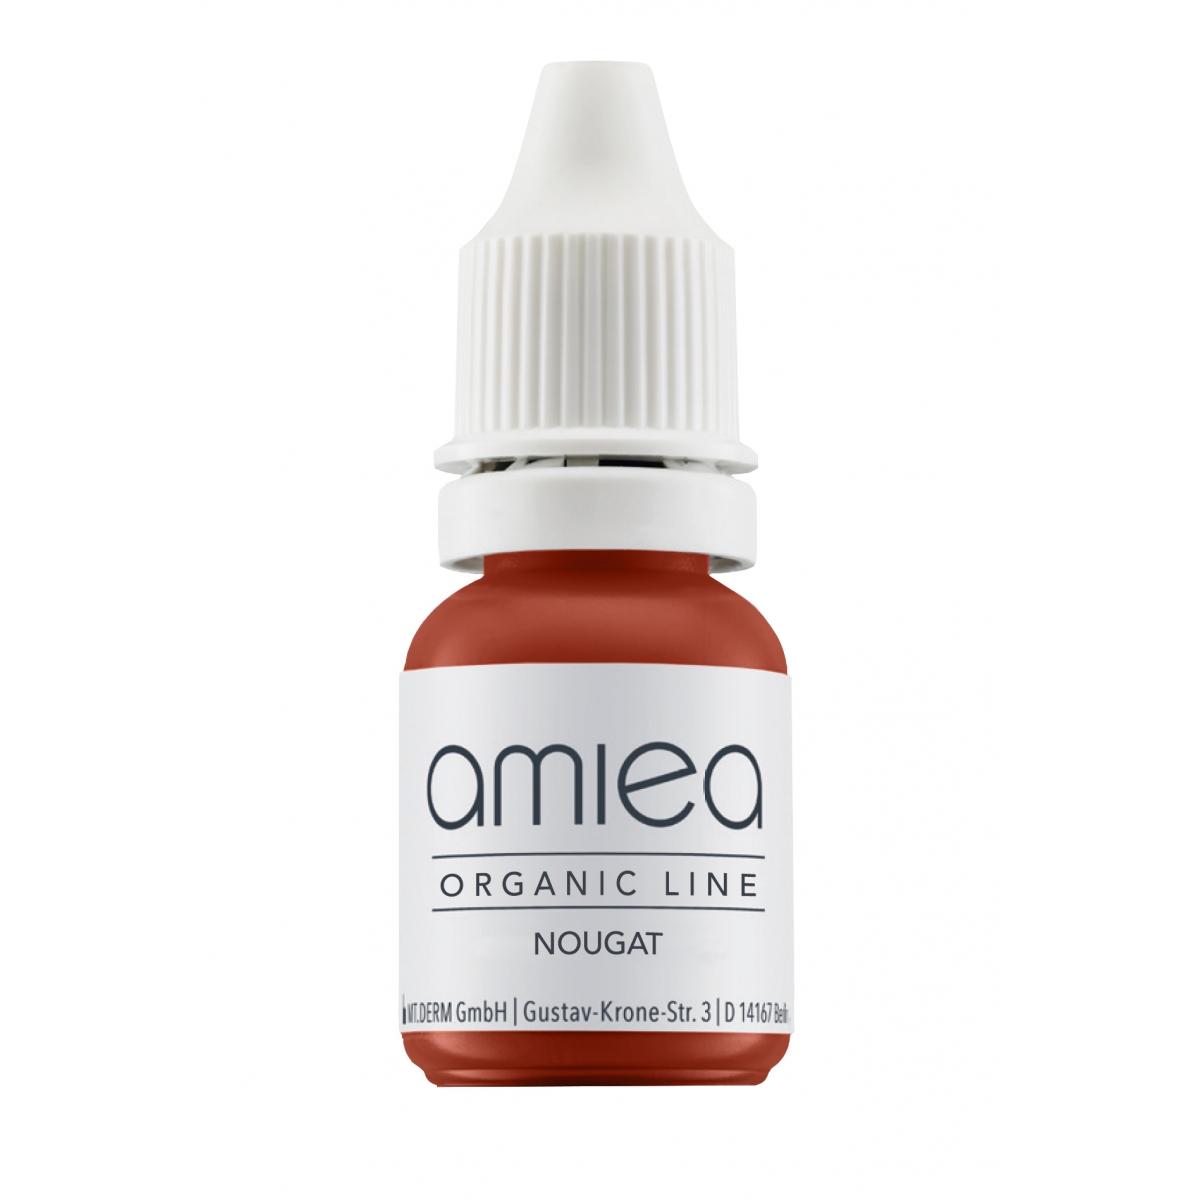 ORGANIC LINE (5ml)  - PIGMENT NOUGAT ORGANICLINE AMIEA (5 ml)